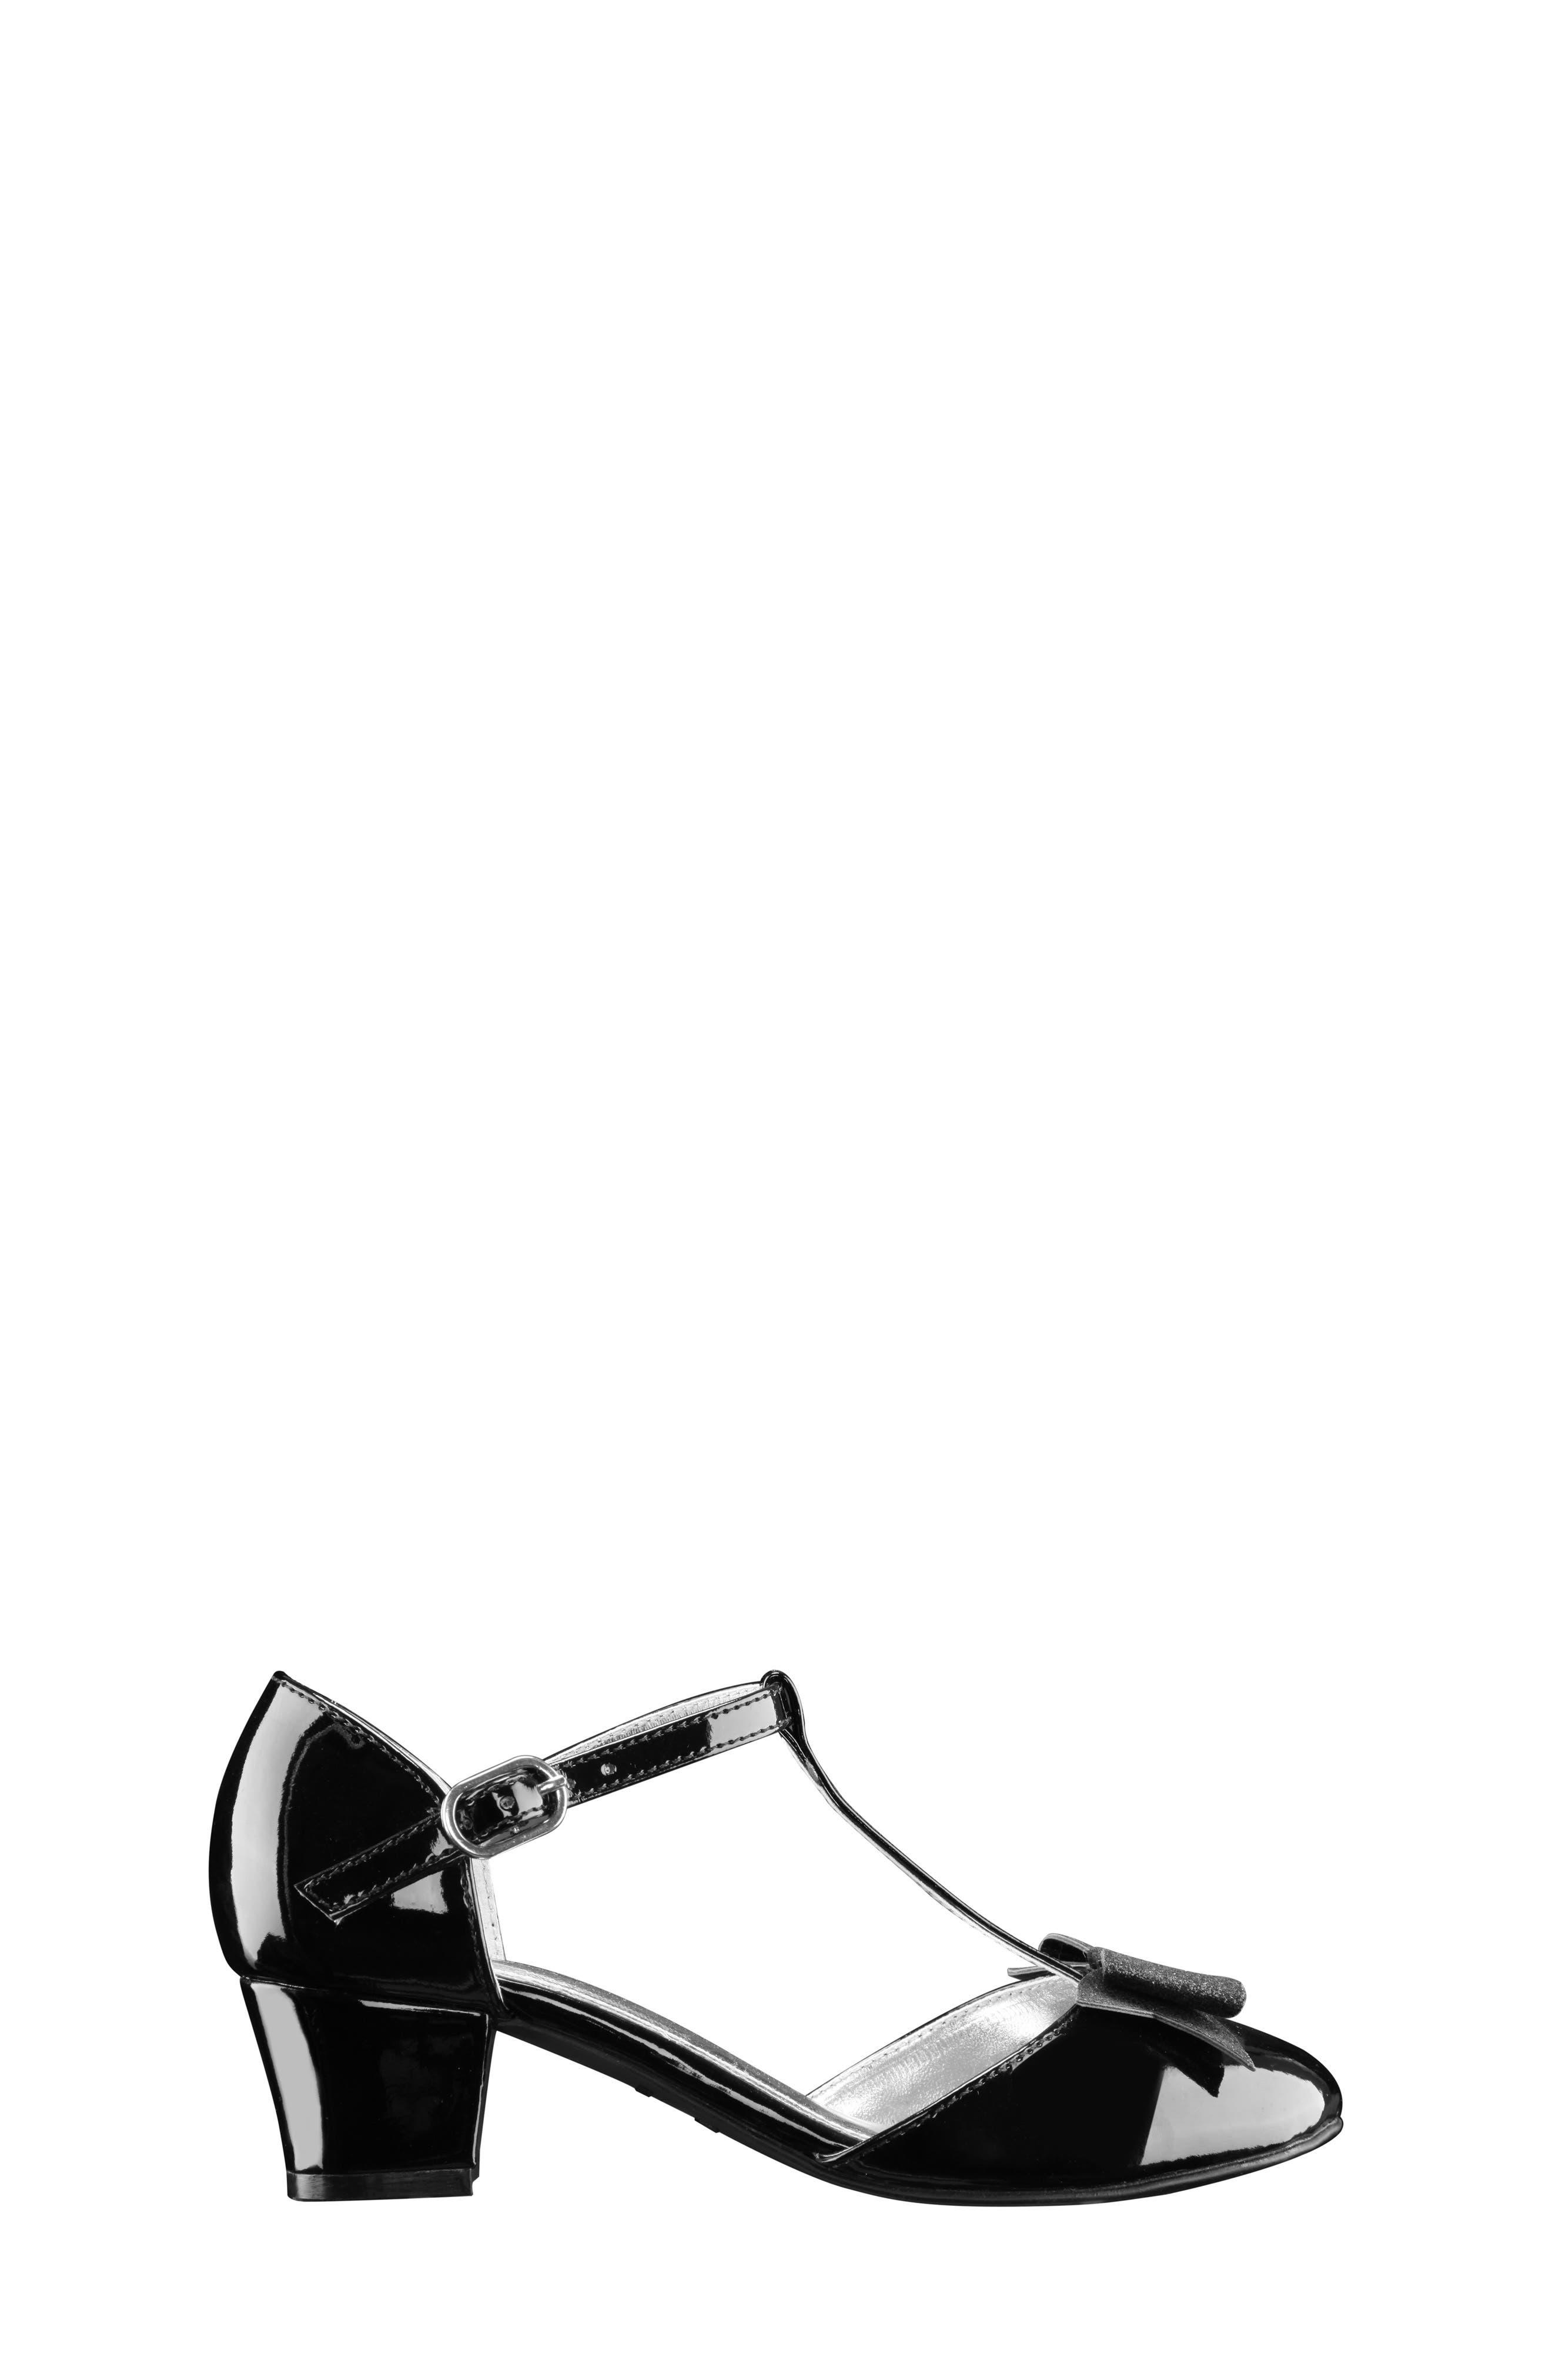 Marvette T-Strap Sandal,                             Alternate thumbnail 5, color,                             Black Patent